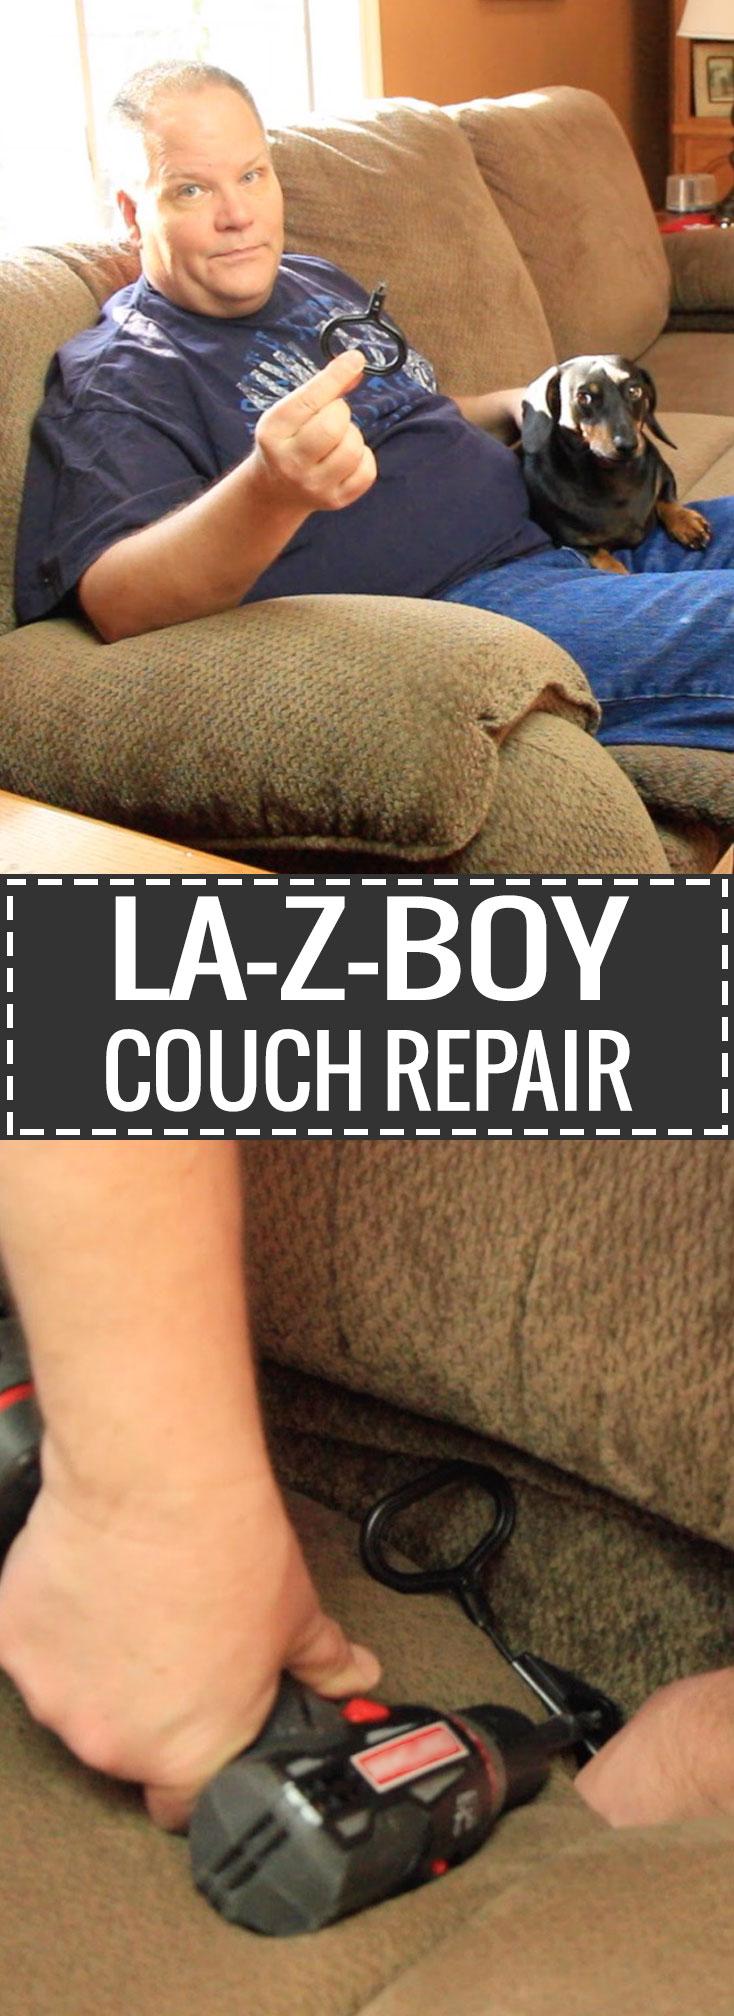 La-Z-Boy Couch Recliner Repair